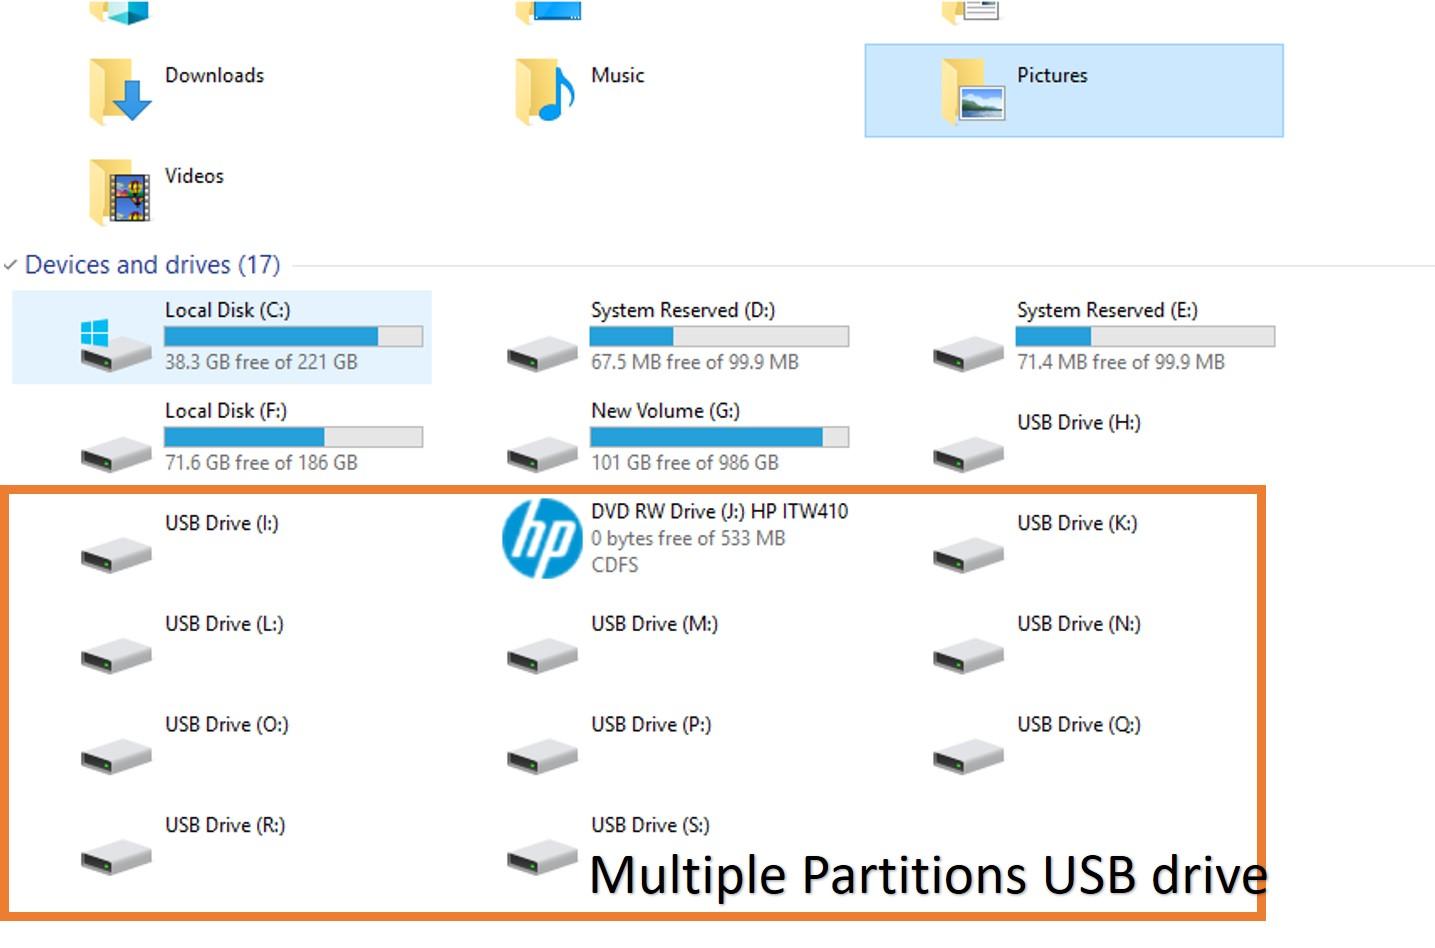 Delete muliple partitons USB drive